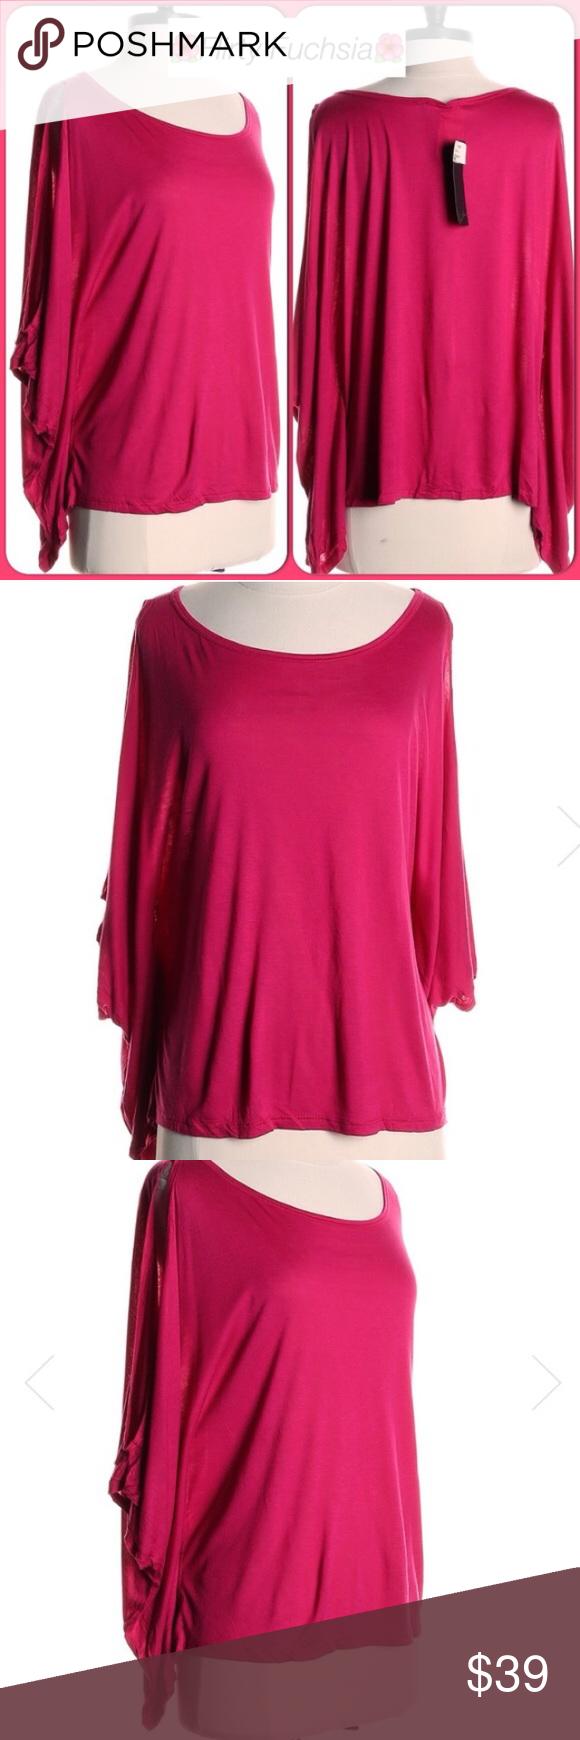 "NWT🌺Fuchsia Open Arm Kaftan Soft Modal Top🌺 🌺Flirty Fuchsia Open Arm Caftan Top🌺 Soft T-Shirt Feel Modal/Rayon Blend. Bust-46"" Length-24"" Lush Tops"